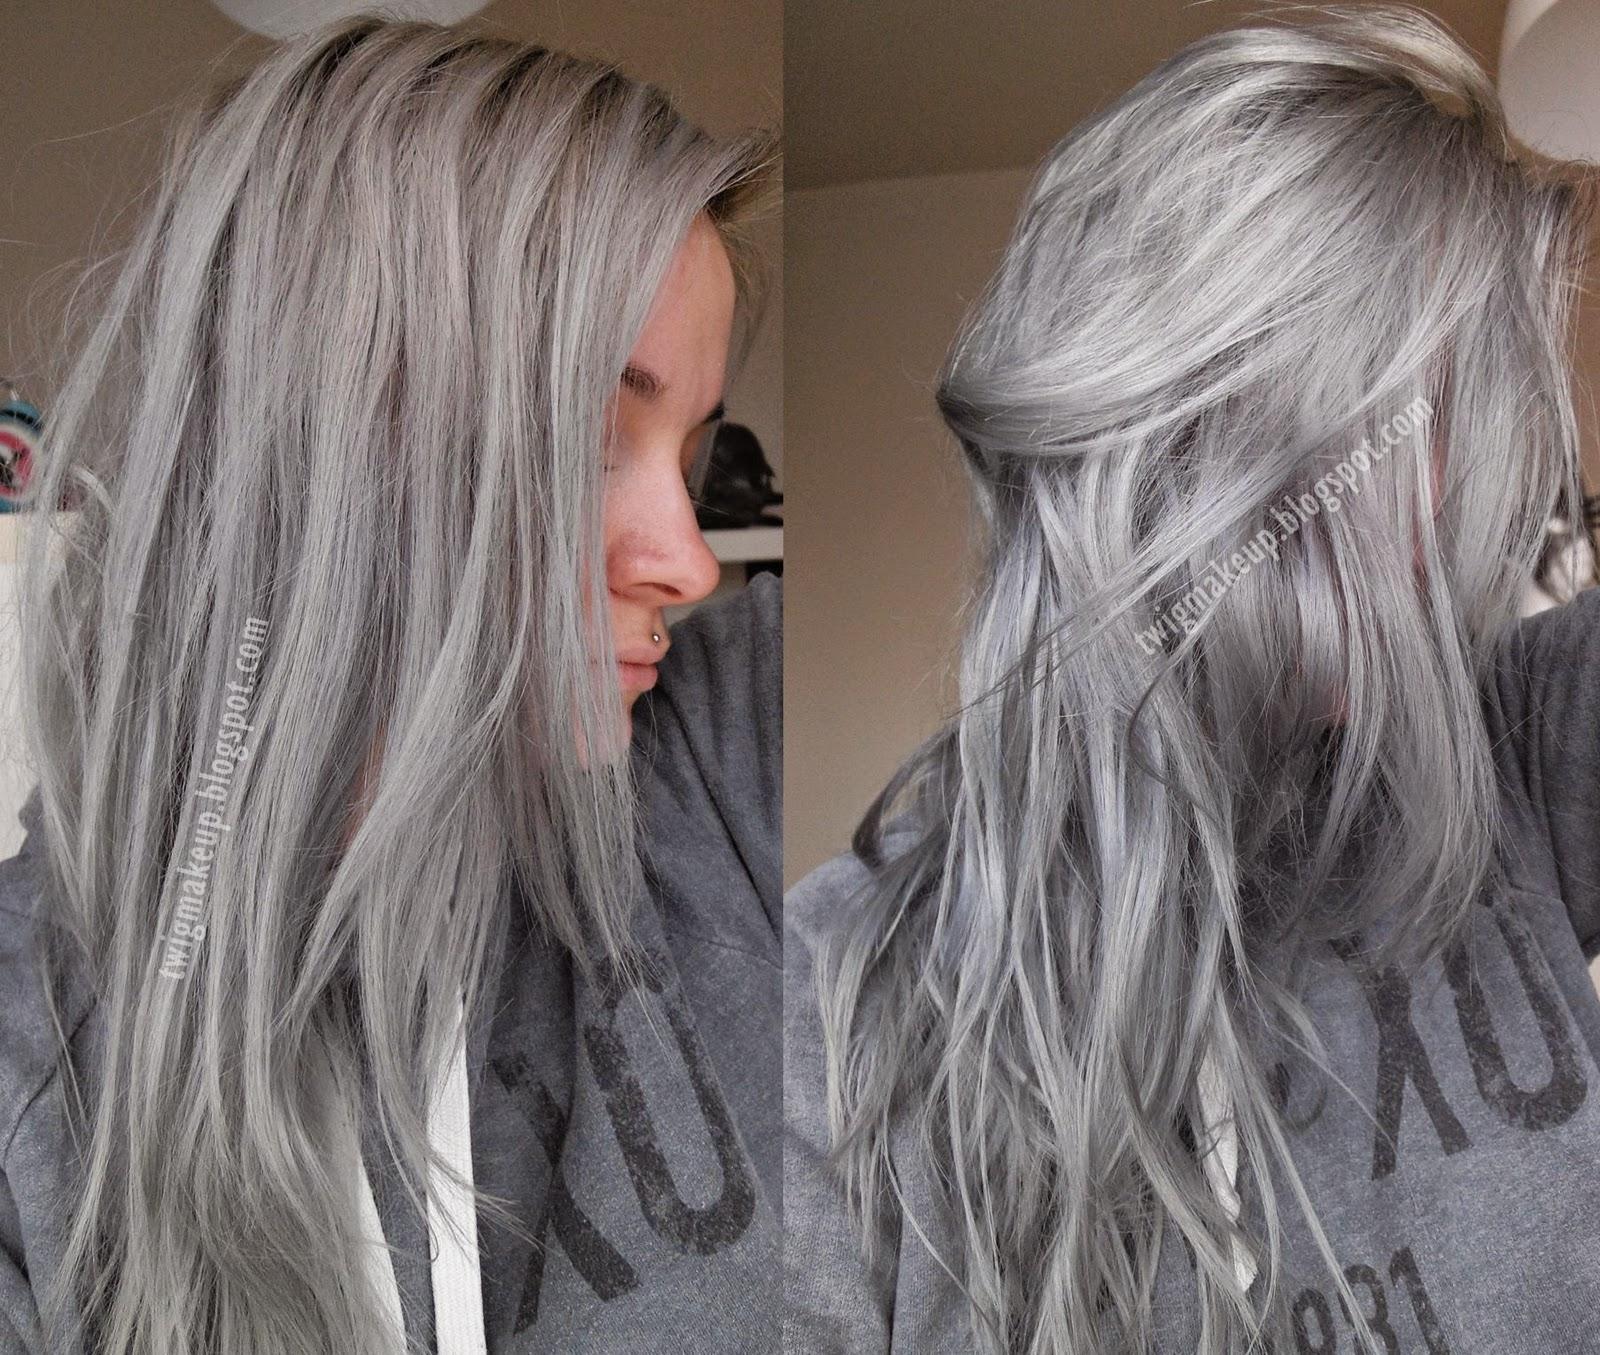 Short pravana silver hair color hair colors ideas of pravana hair pravana chroma silk hair color dark brown hairs nvjuhfo Images